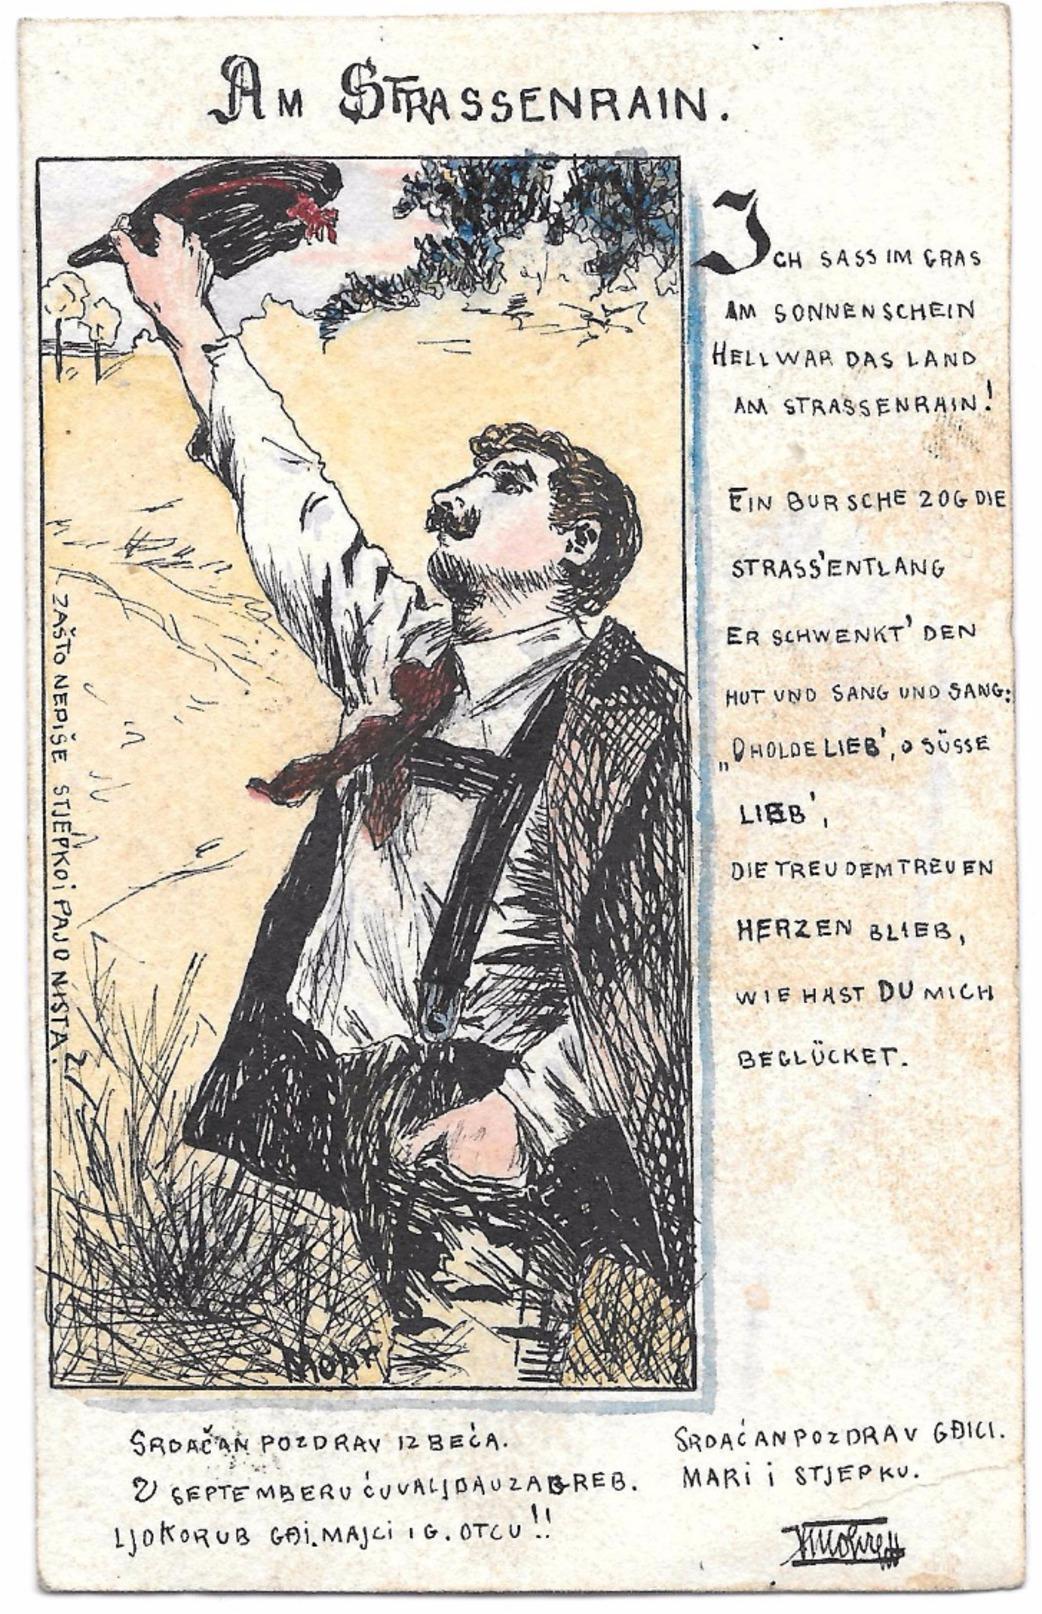 Art Nouveau RAPHAEL KIRCHNER?  -  Cartolina Dipinta A Mano ! -  - INEDITA -  NON STAMPATA   RRR  Unica - Kirchner, Raphael